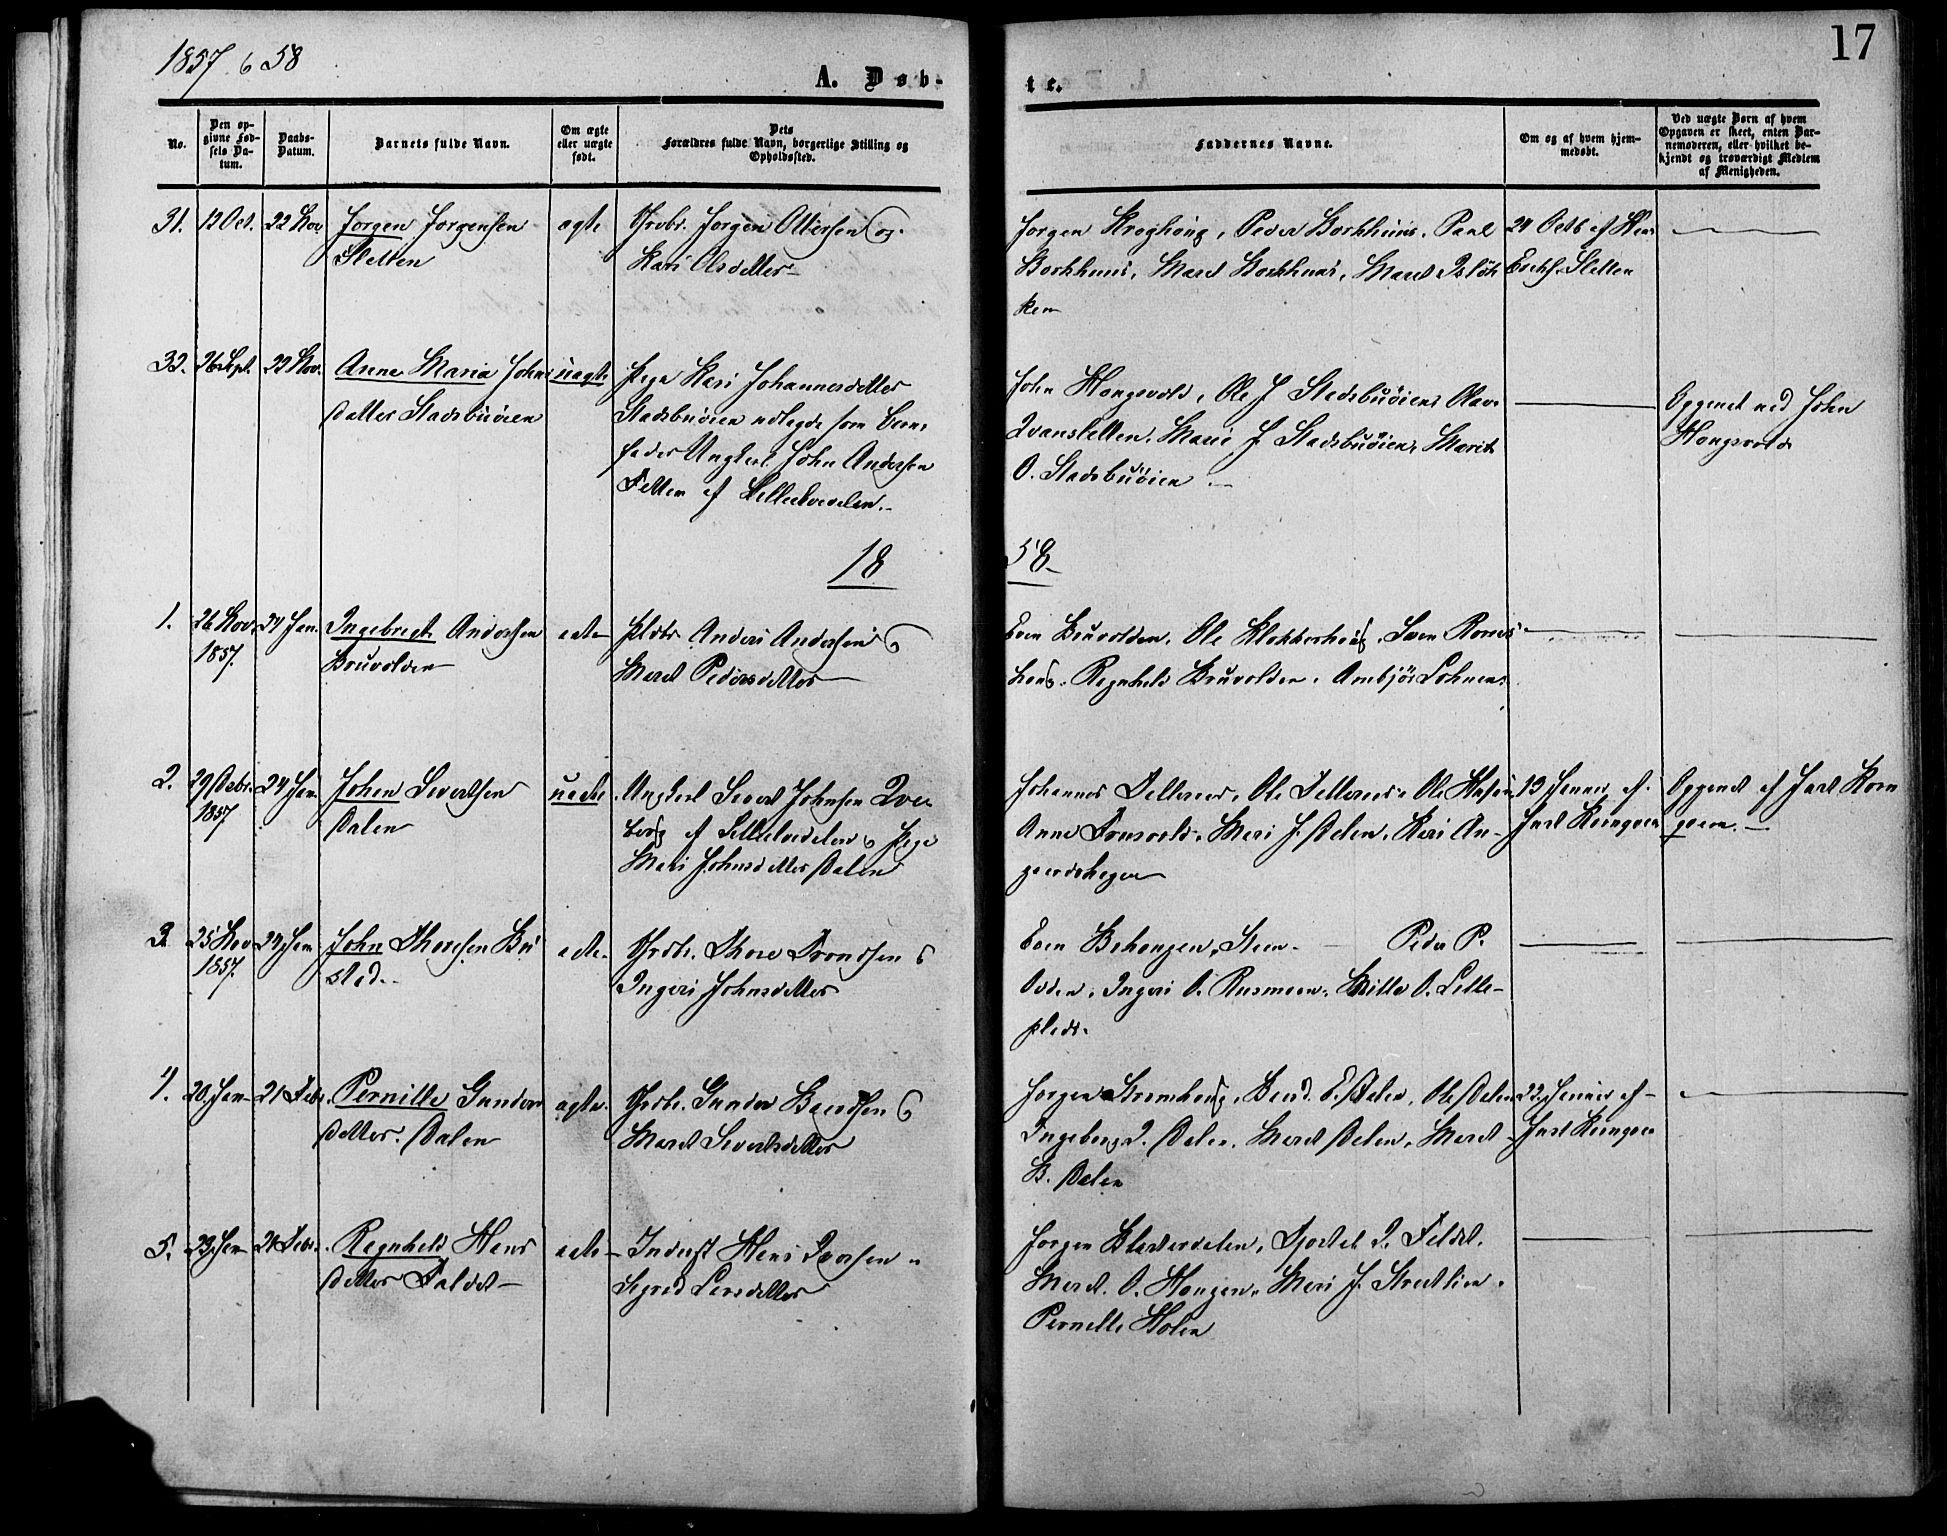 SAH, Lesja prestekontor, Ministerialbok nr. 7, 1854-1862, s. 17